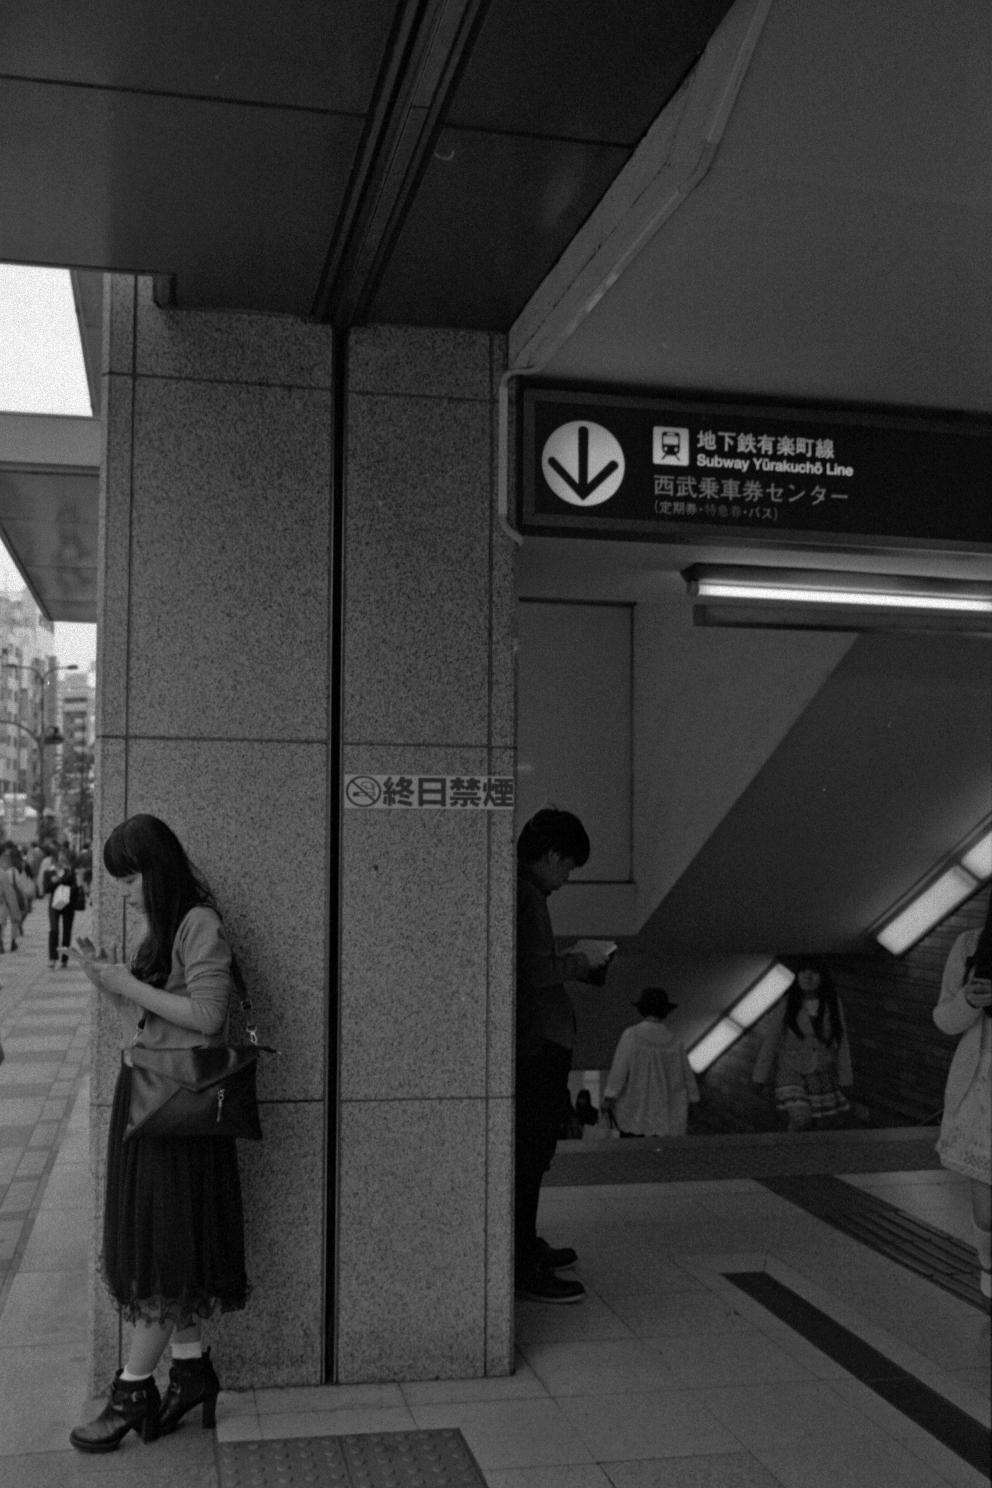 20140523 LeicaM4-P elmarit28 TMY TMD 003